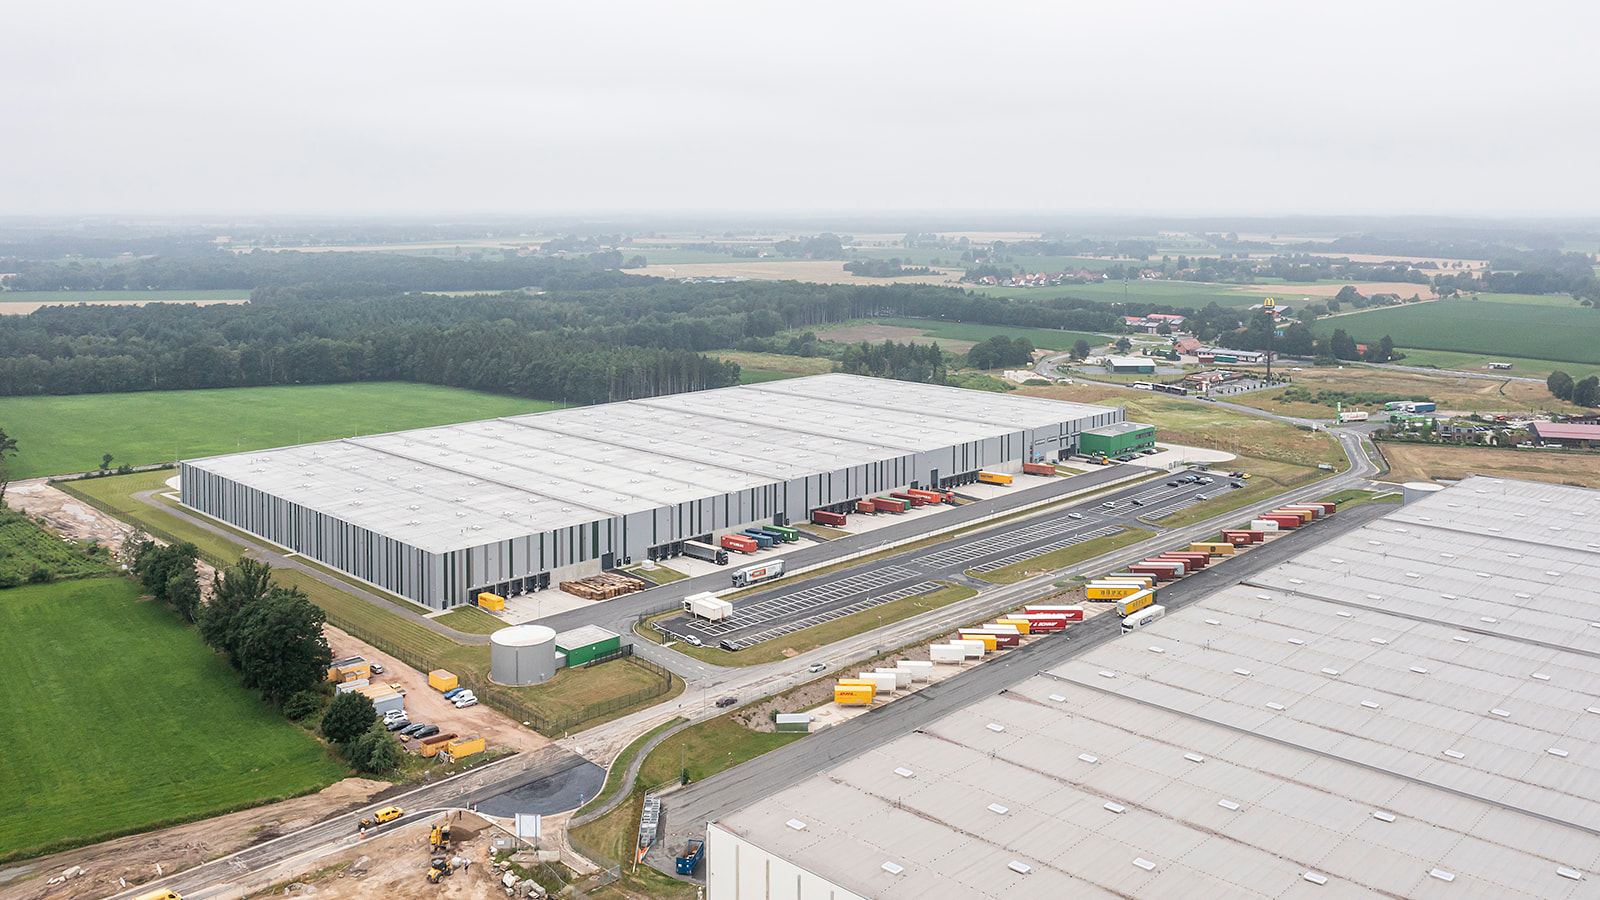 Dronephoto warehouse